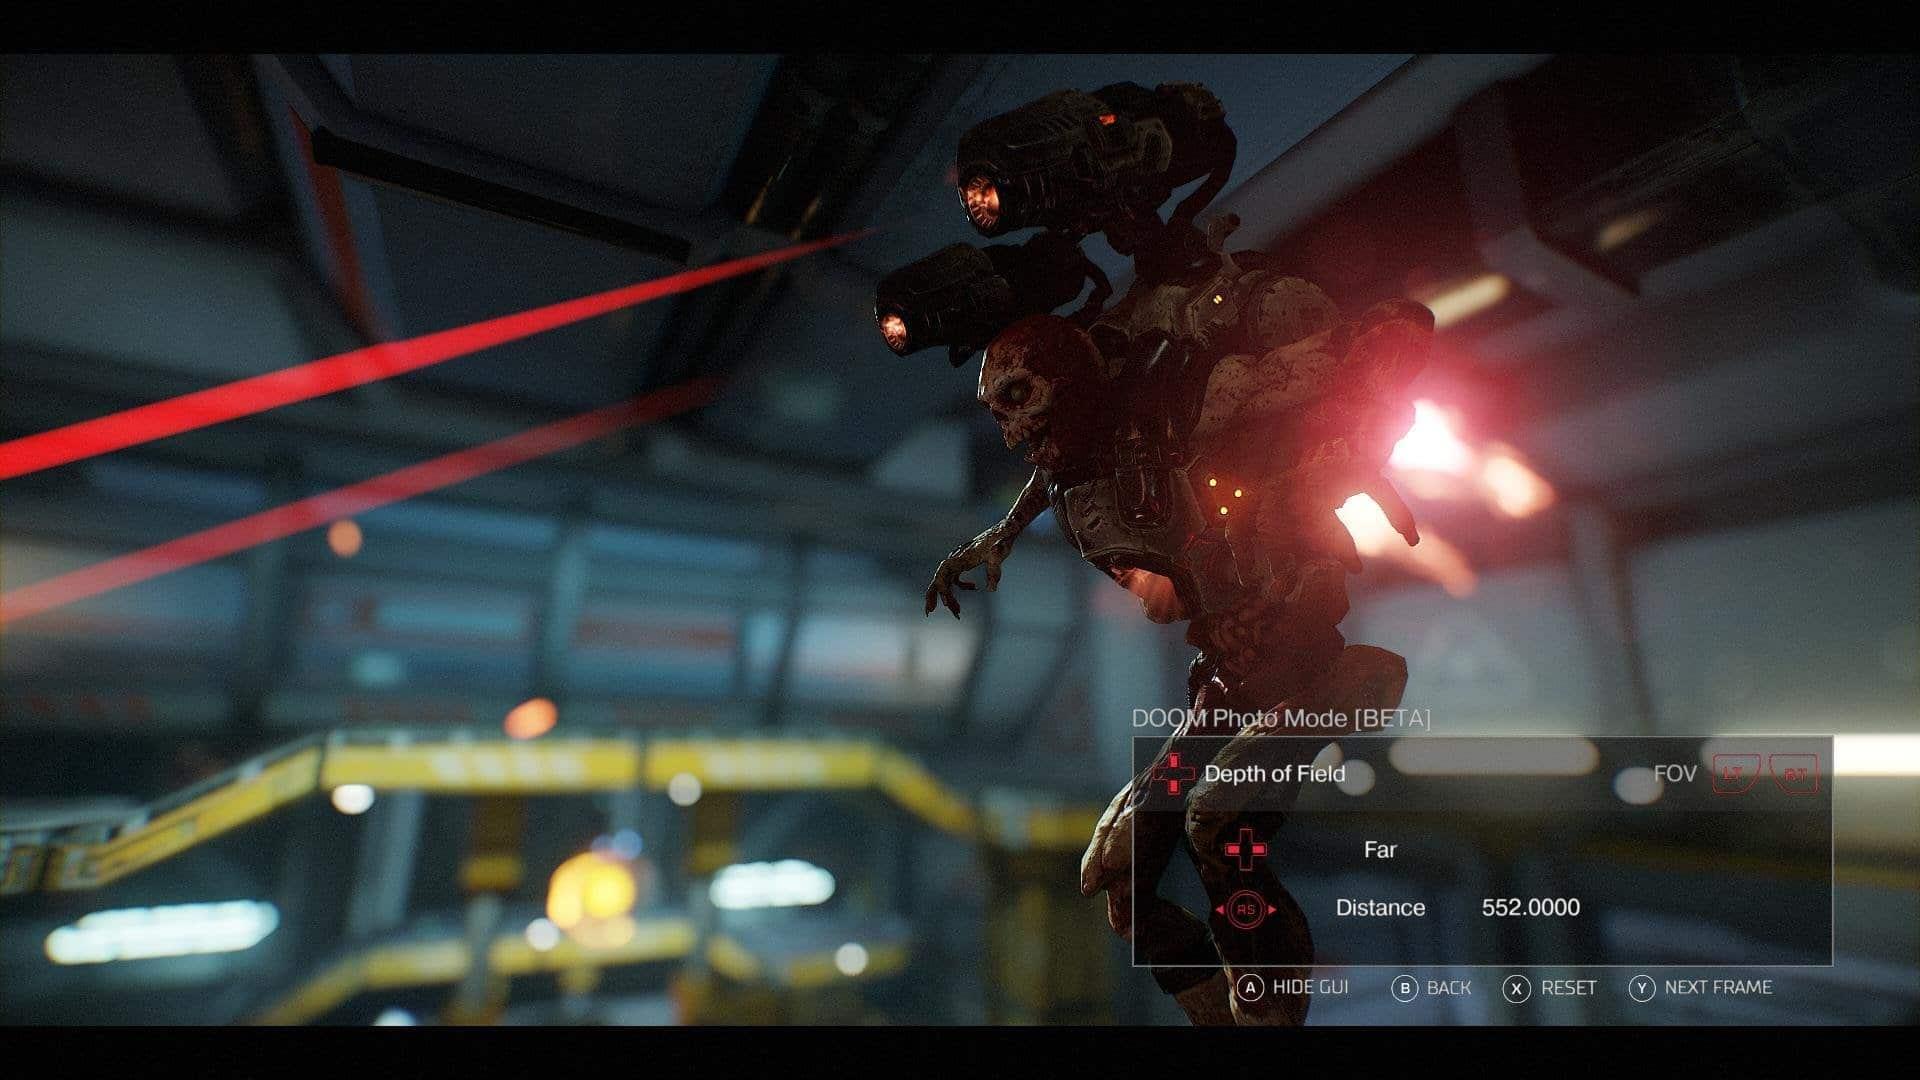 خرید استیم گیفت Doom Eternal اسکرین شات 1